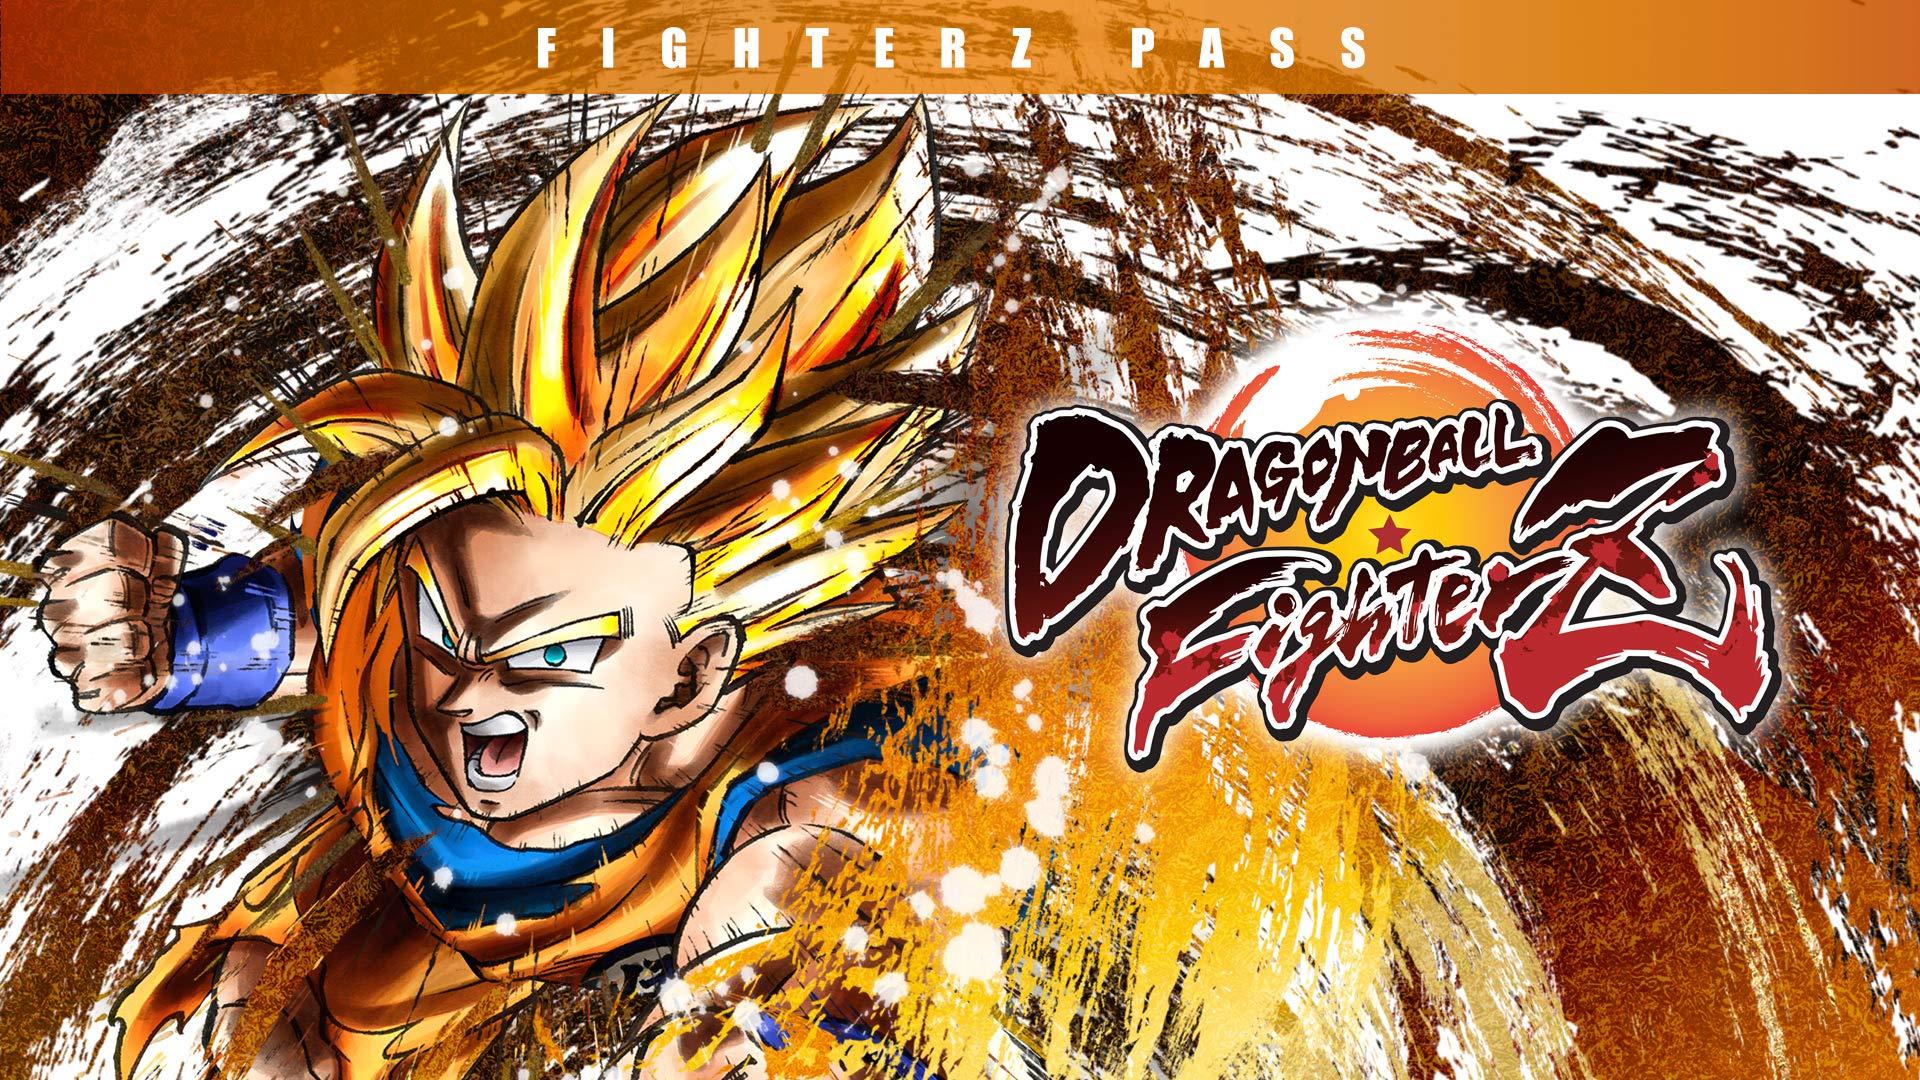 DRAGON BALL FIGHTERZ - FighterZ Pass 2 - Nintendo Switch [Digital Code]